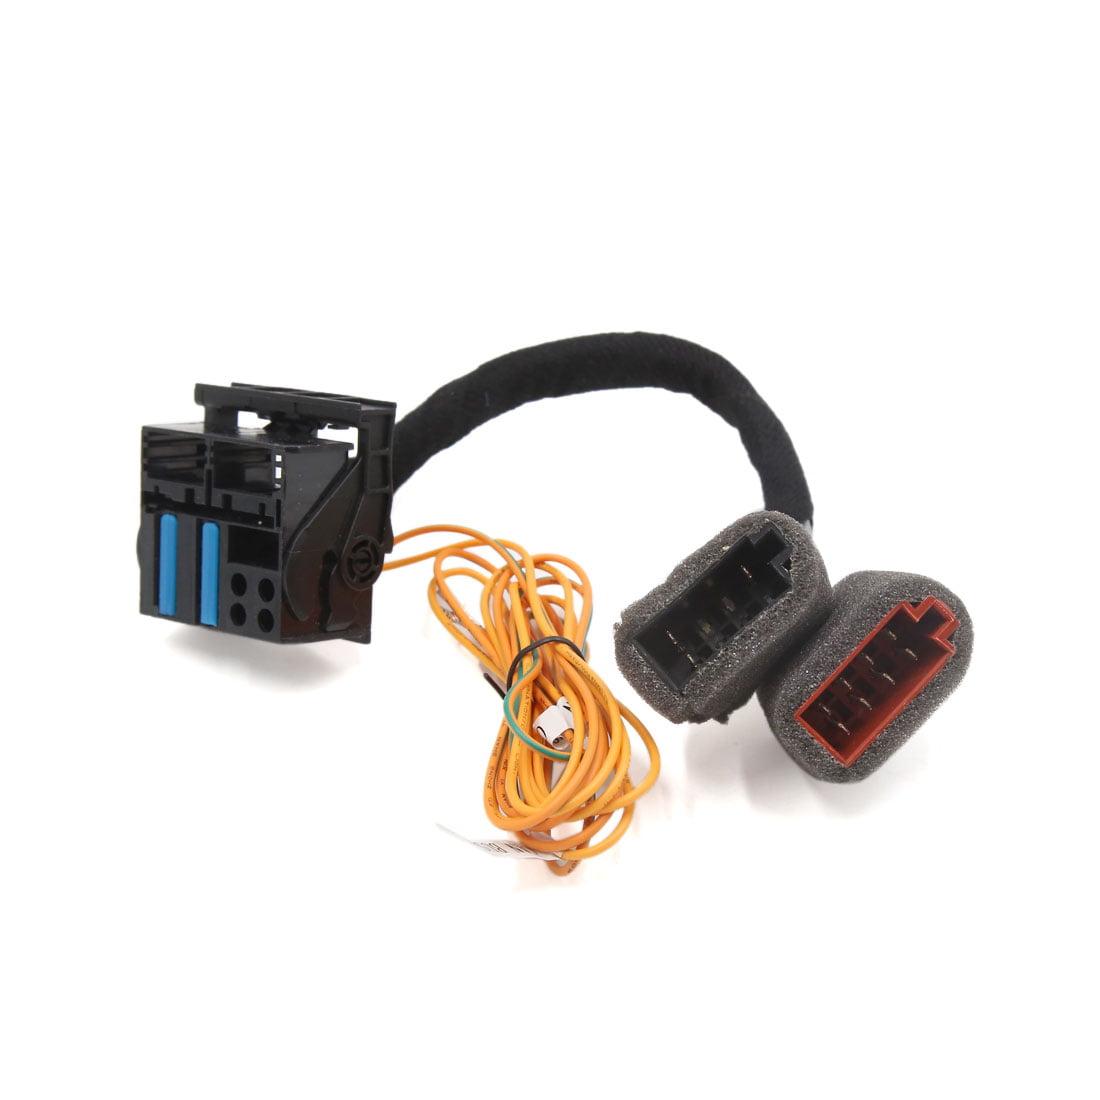 Car Radio Stereo CD Player Wiring Harness Connector for Sagitar Magotan Polo